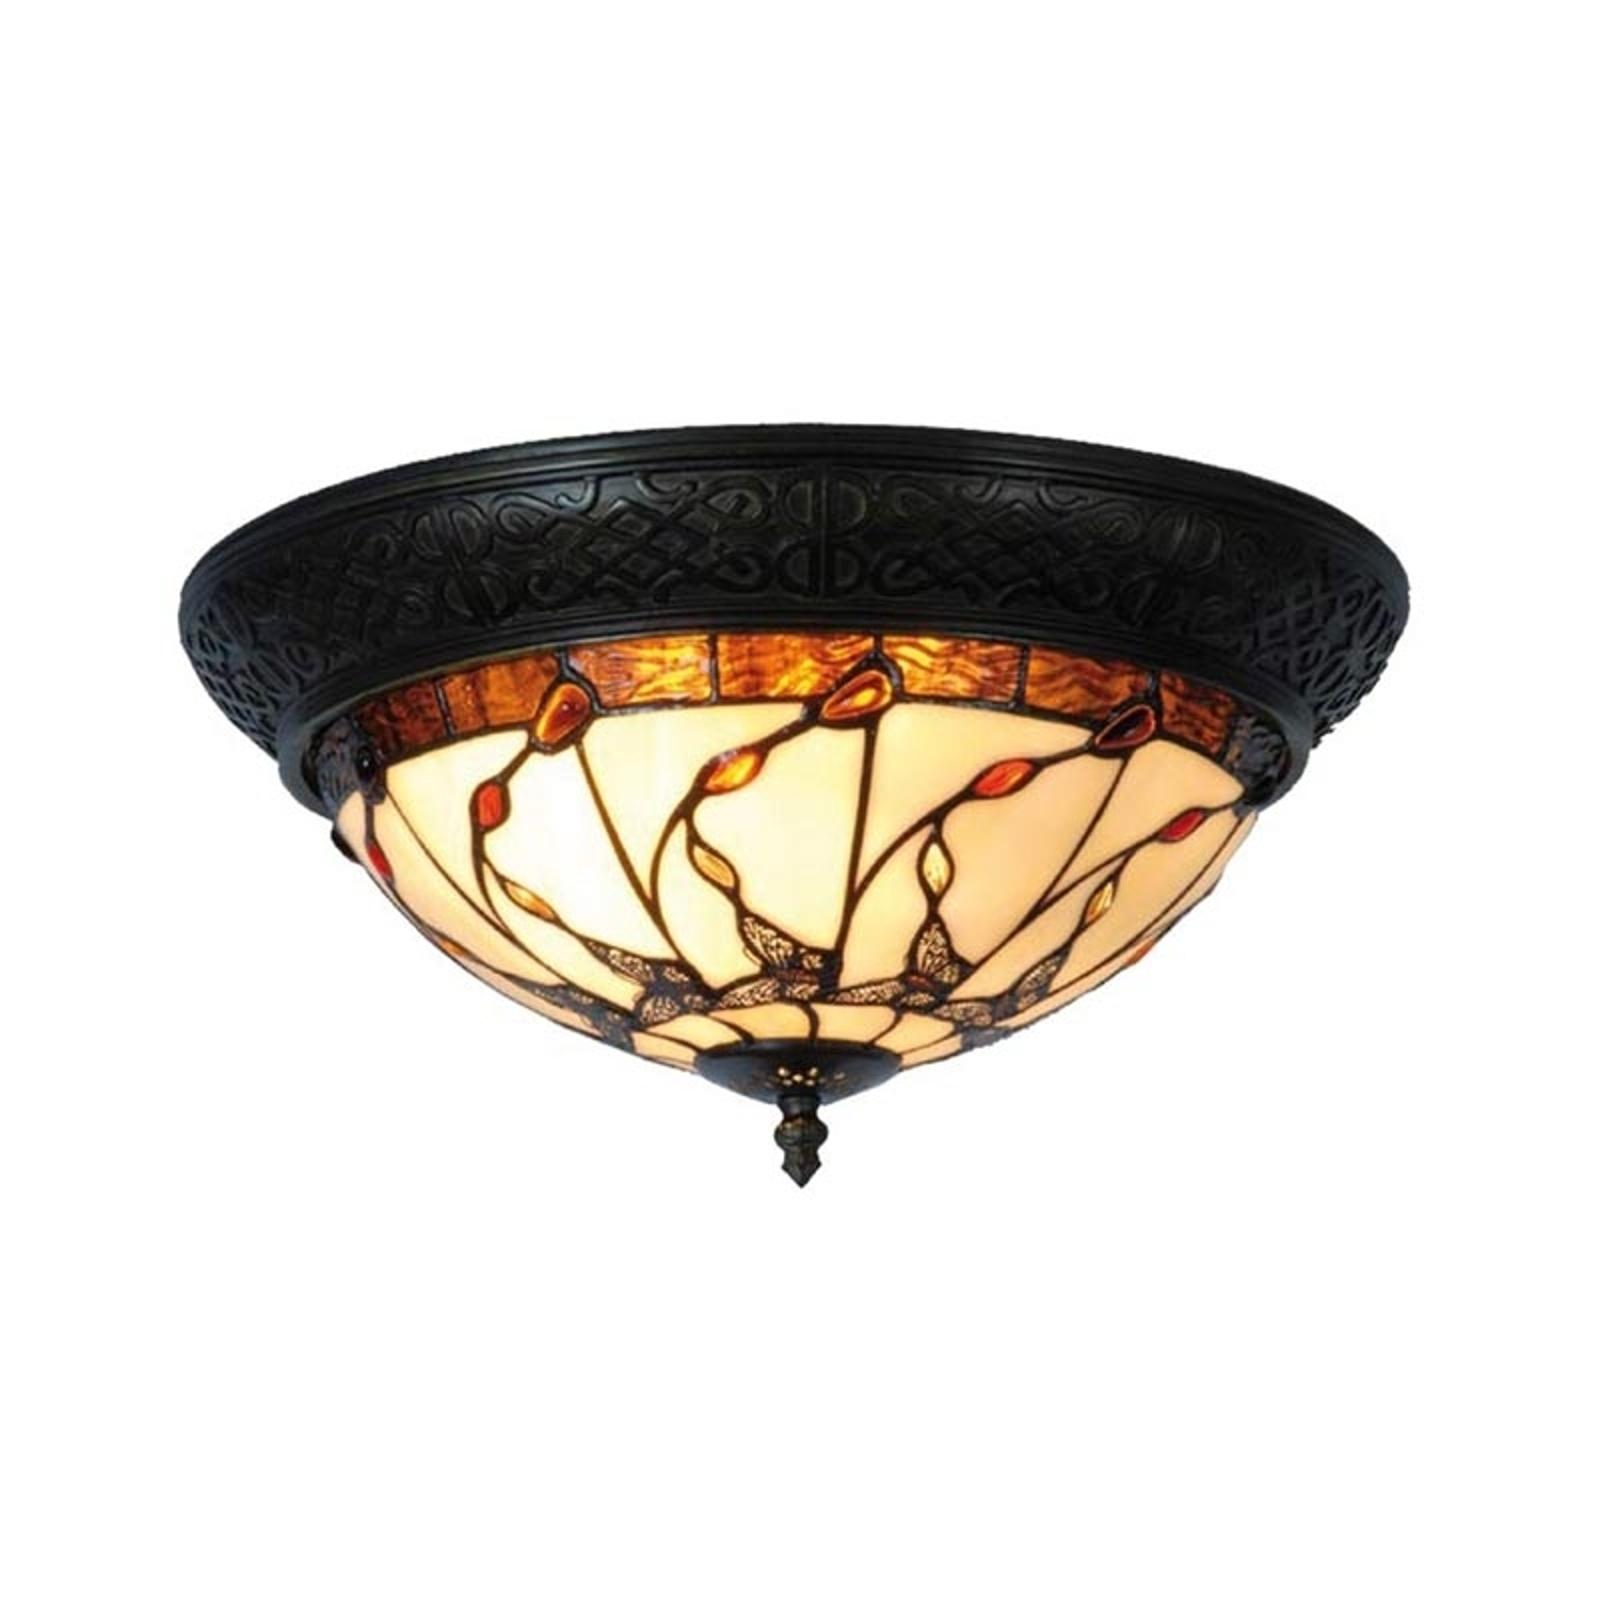 Lampa sufitowa w stylu Tiffany Florent